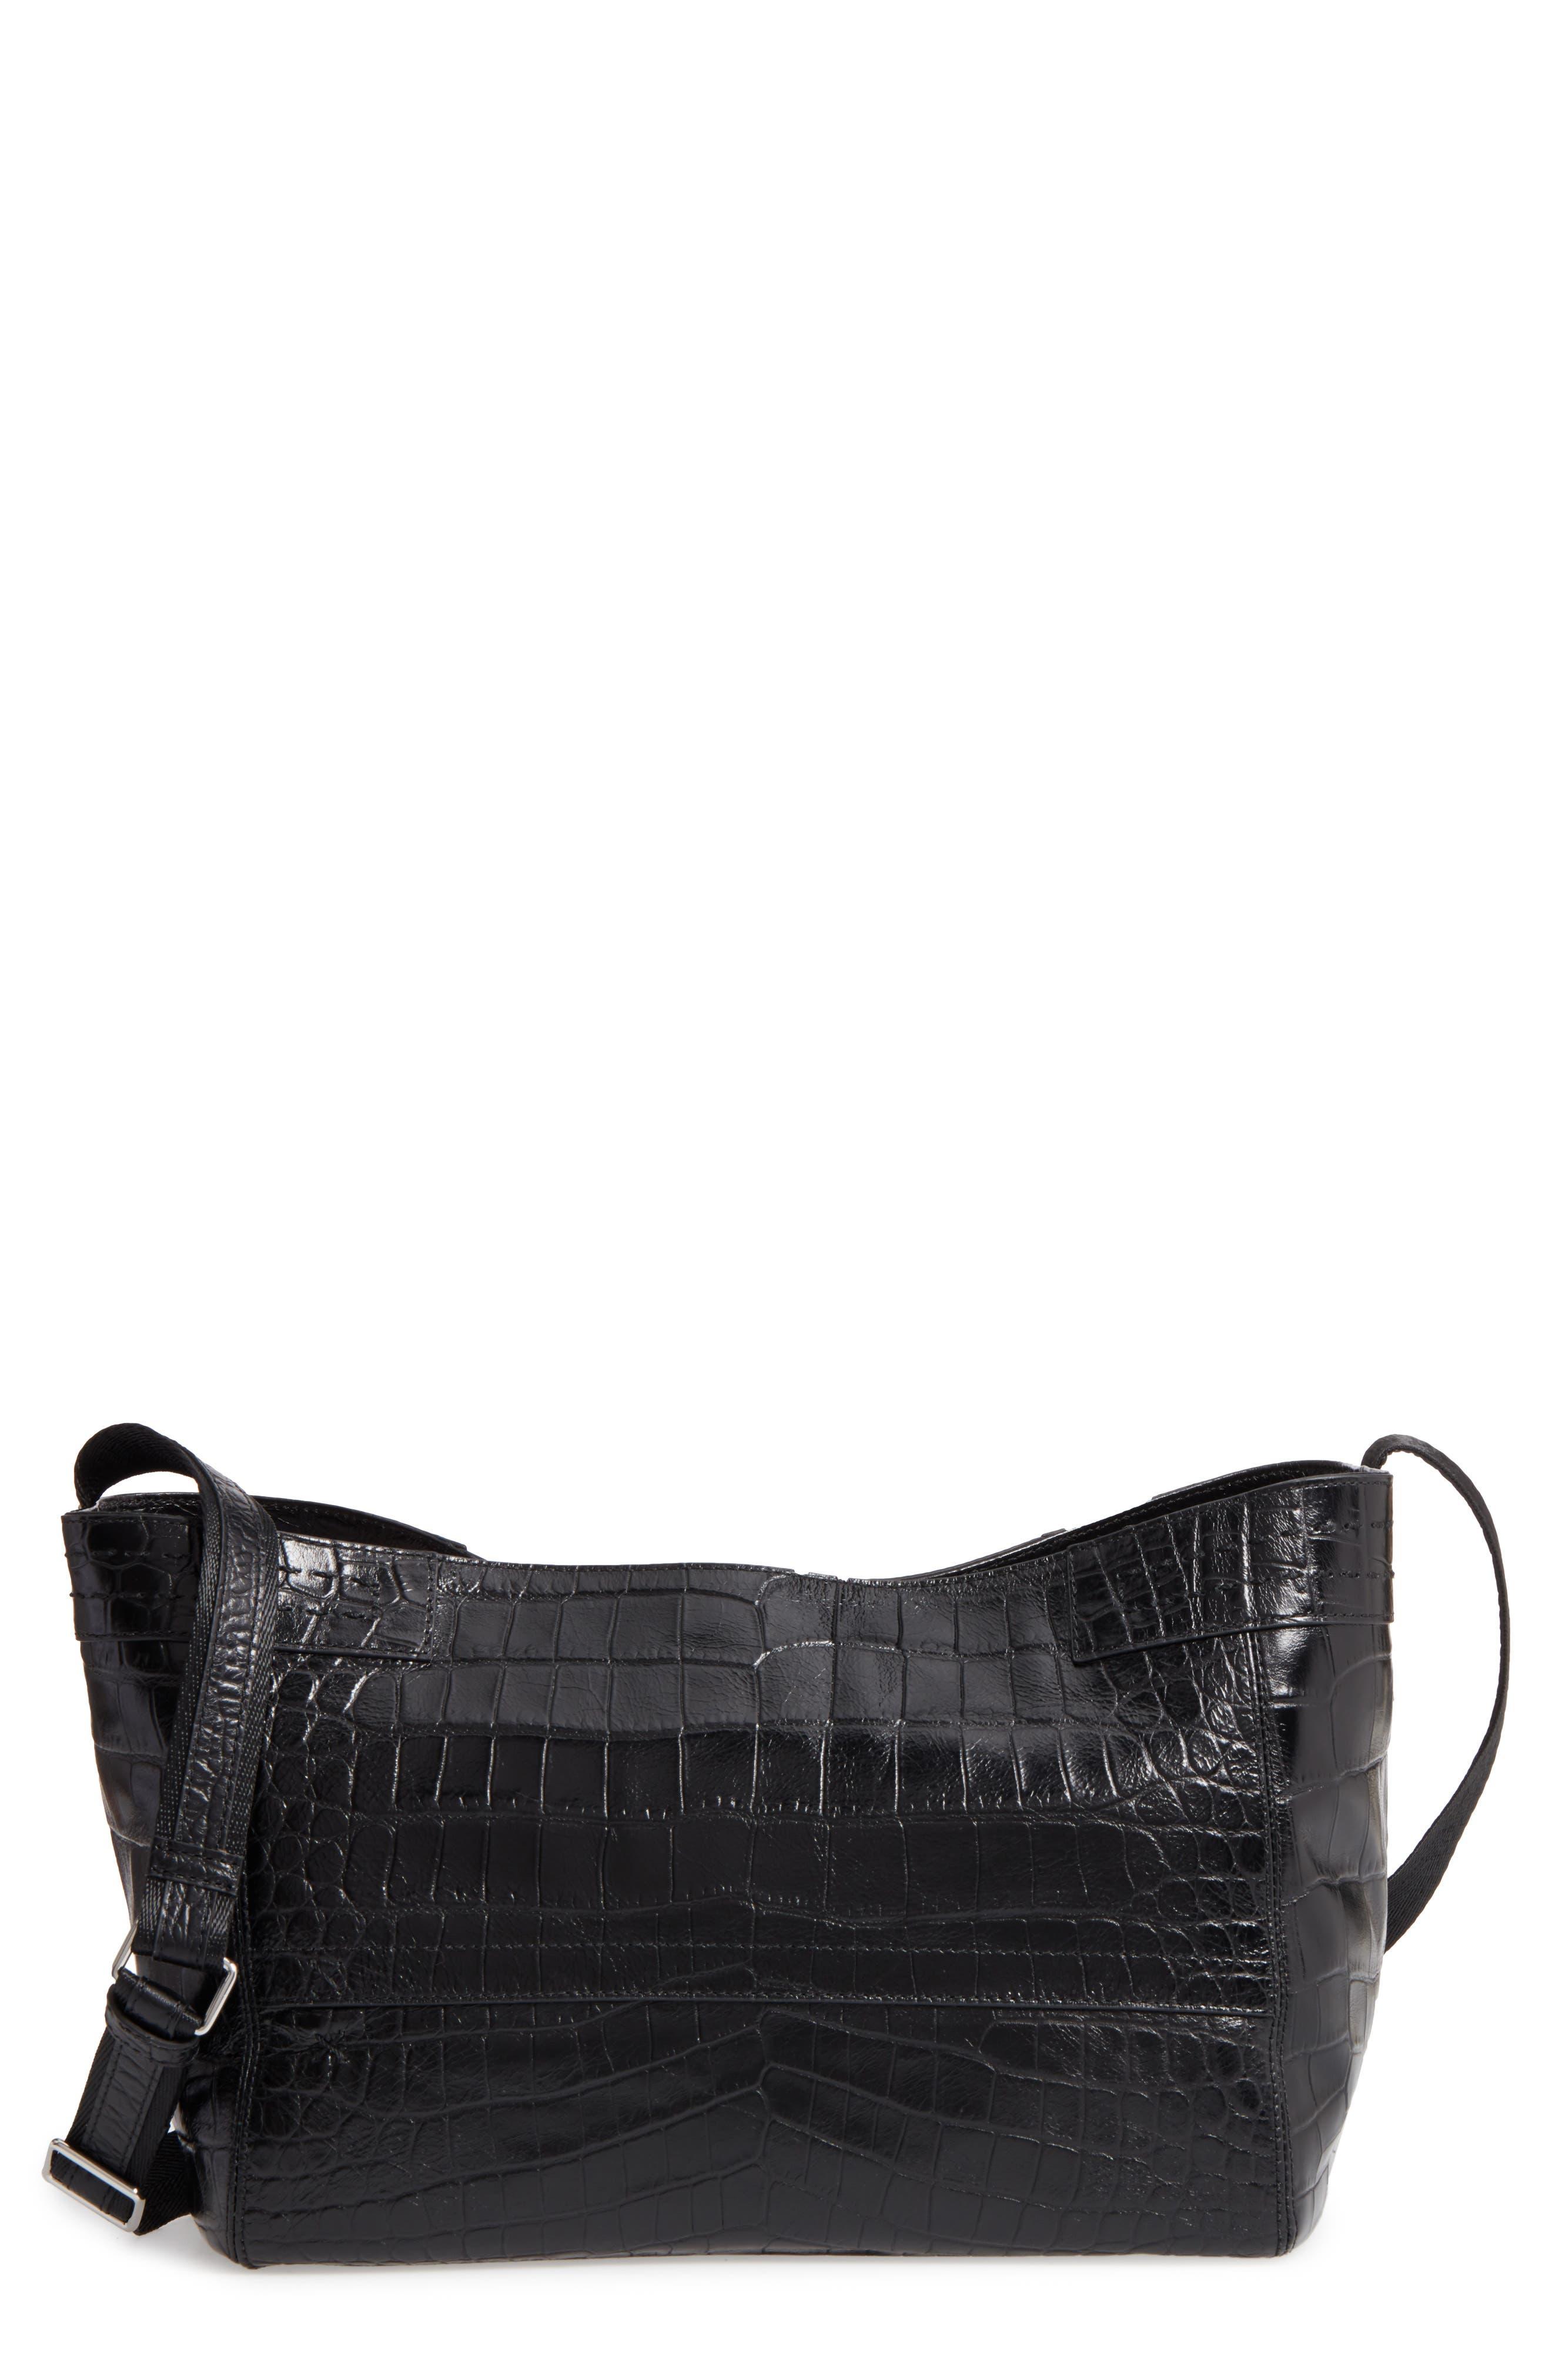 Mini Keely Newspaper Croc Embossed Leather Shoulder/Crossbody Bag,                         Main,                         color, 001